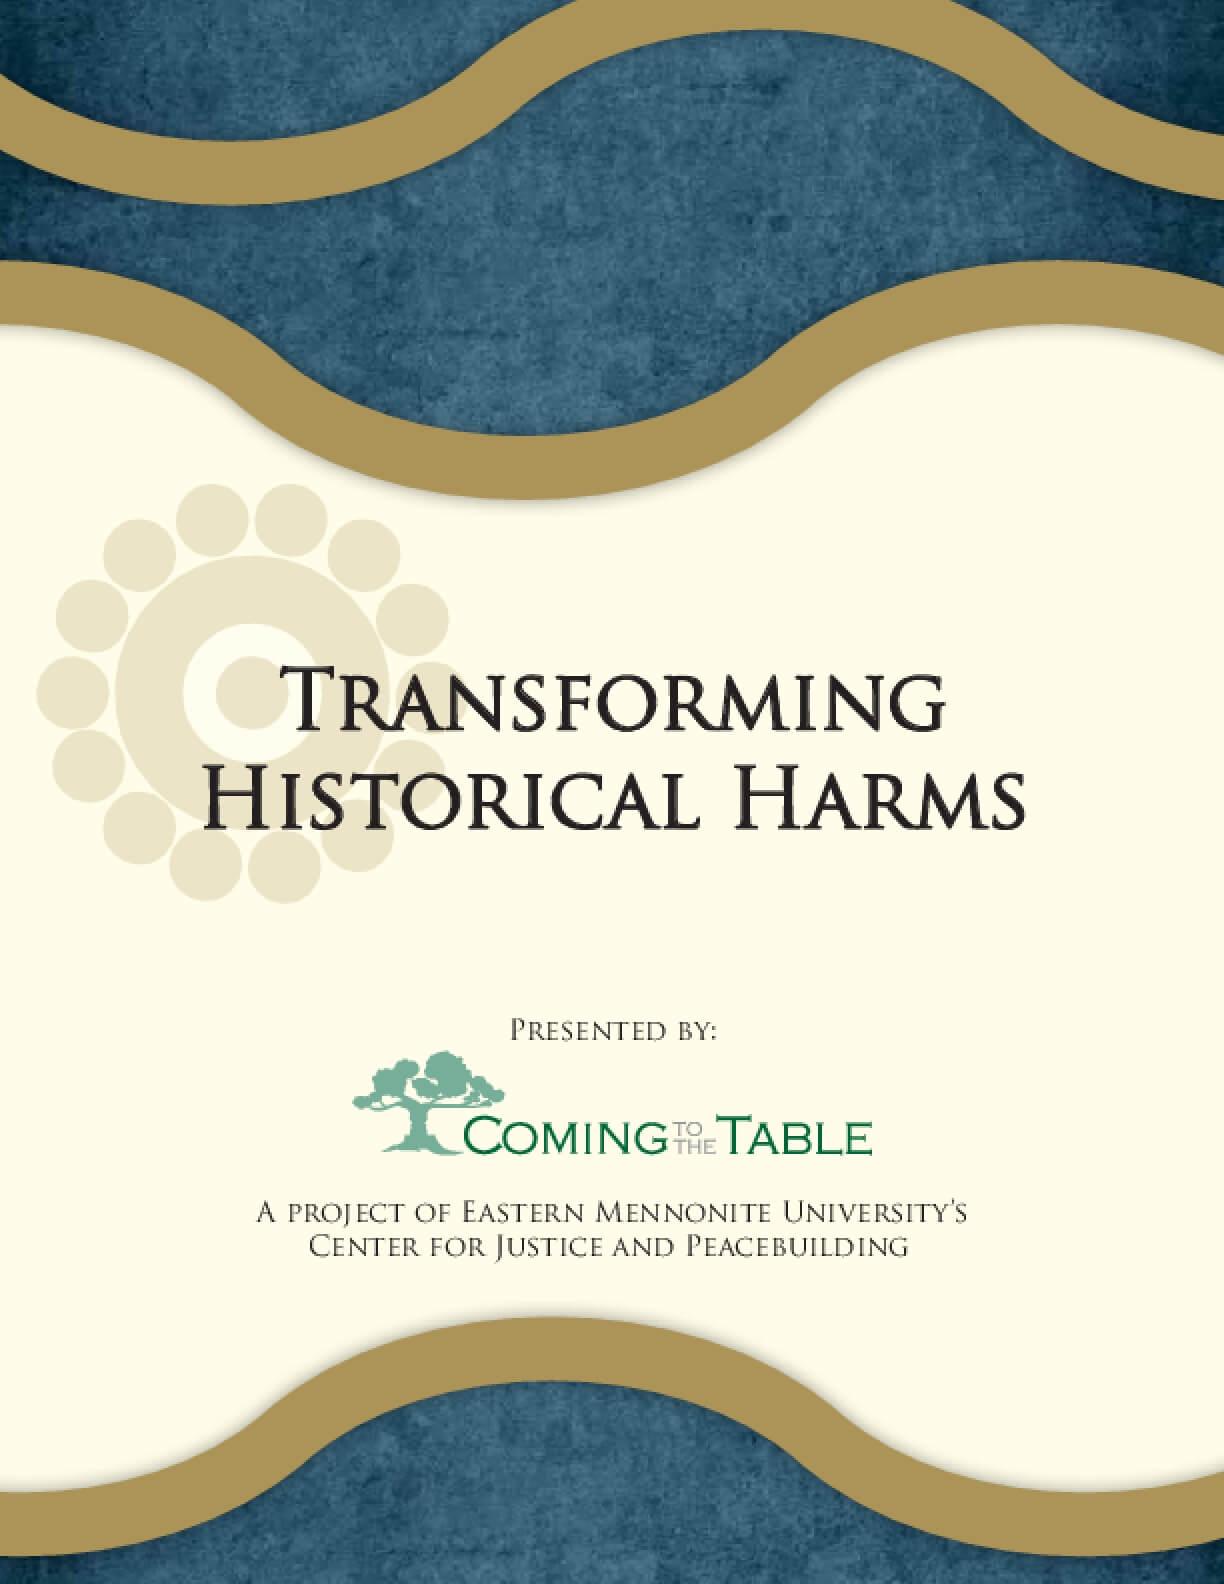 Transforming Historical Harms